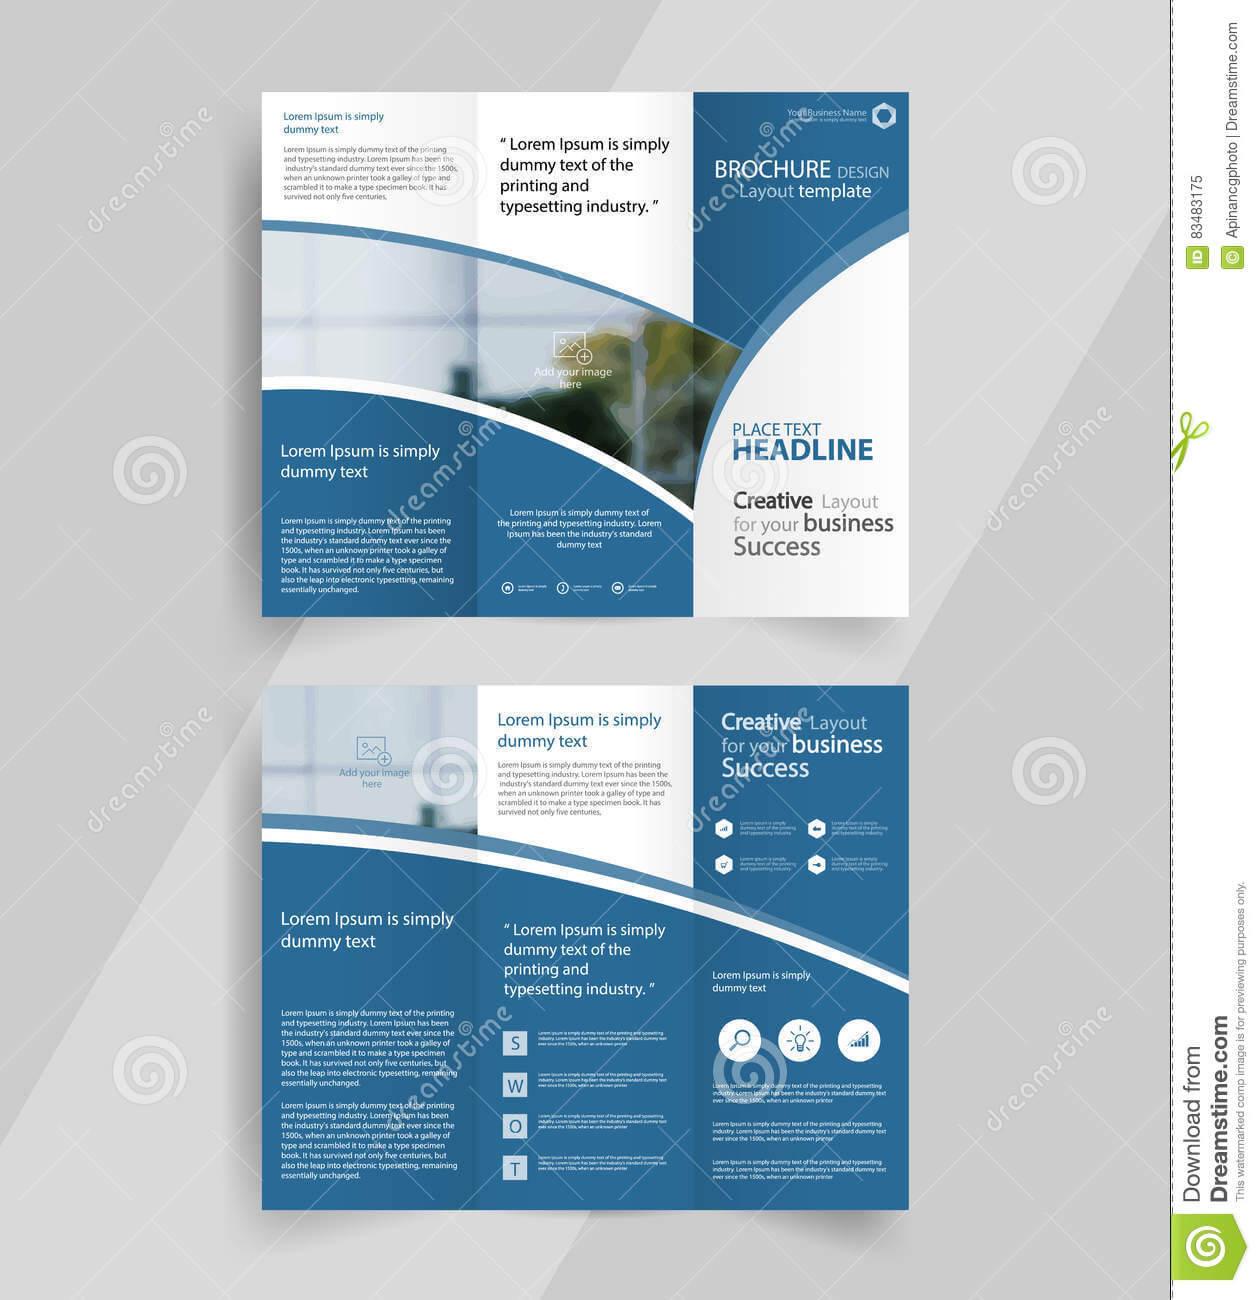 009 Tri Fold Brochure Template Free Download Ai Business Inside Adobe Illustrator Brochure Templates Free Download